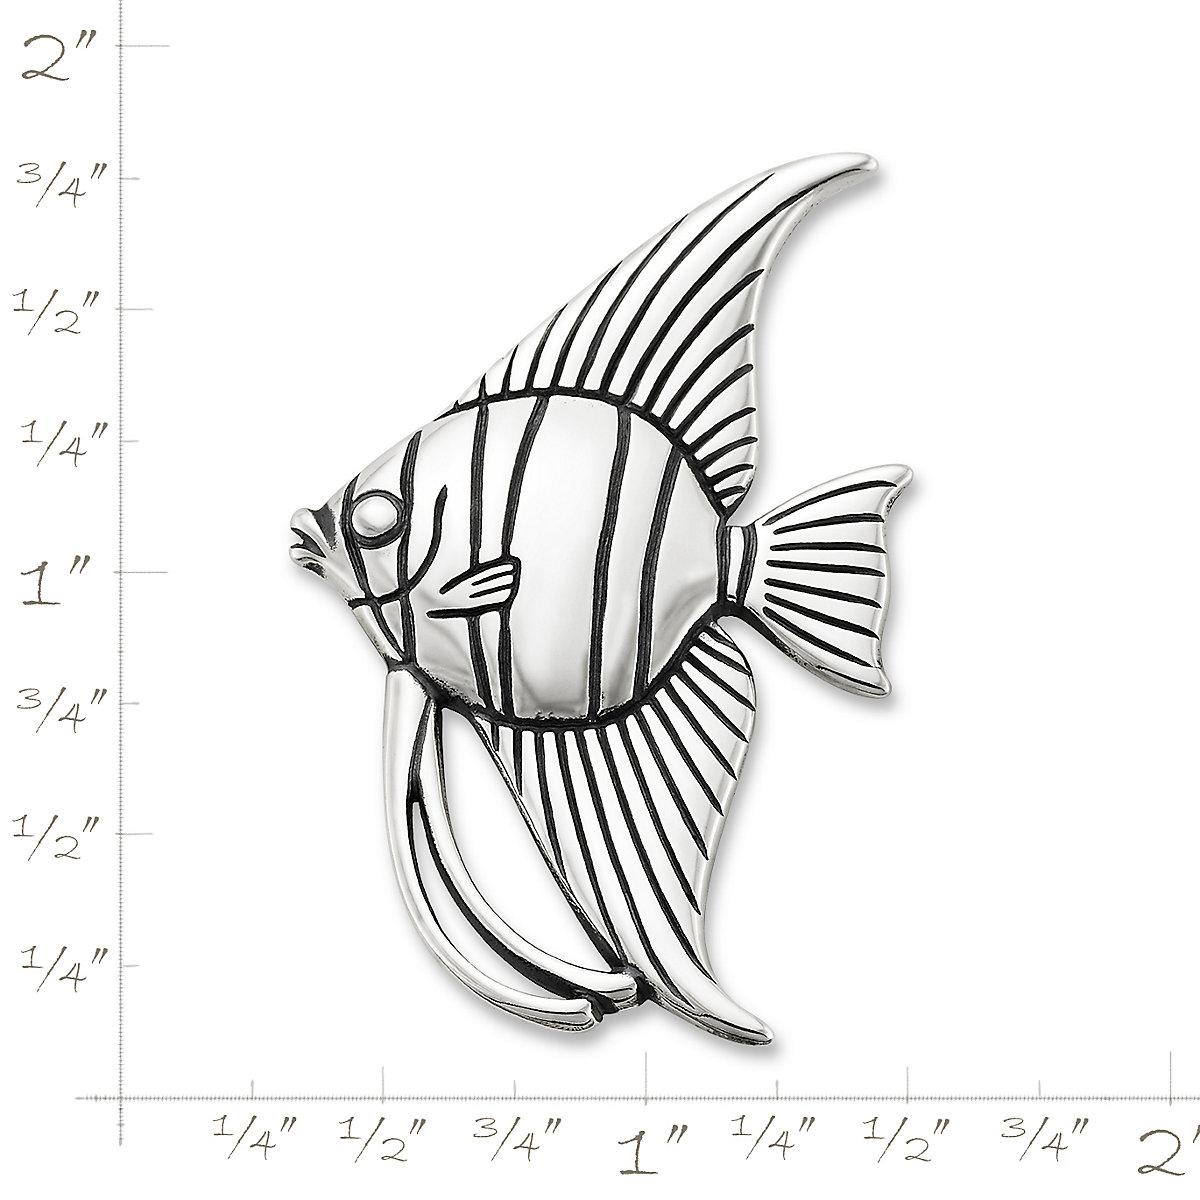 James Avery Angelfish Brooch Pendant Sterling Silver